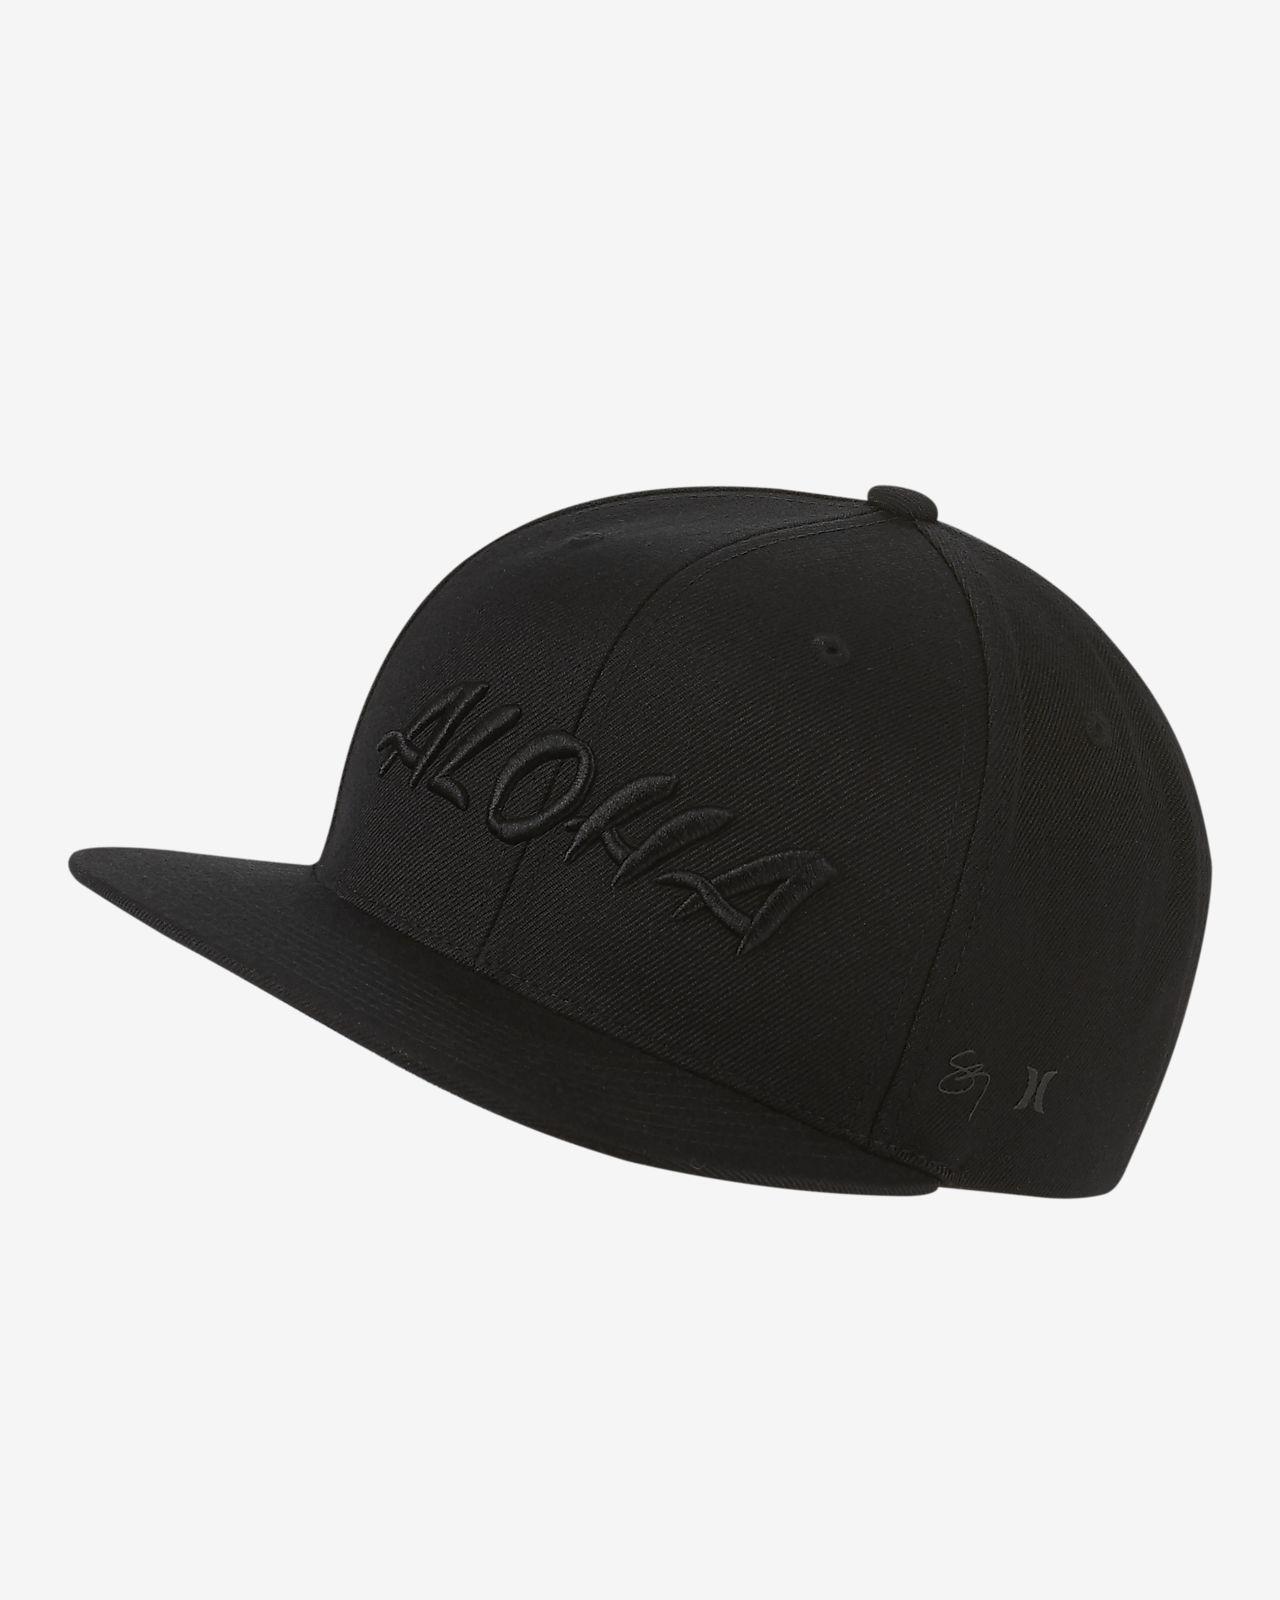 Hurley Sig Zane Maloulu Men's Hat